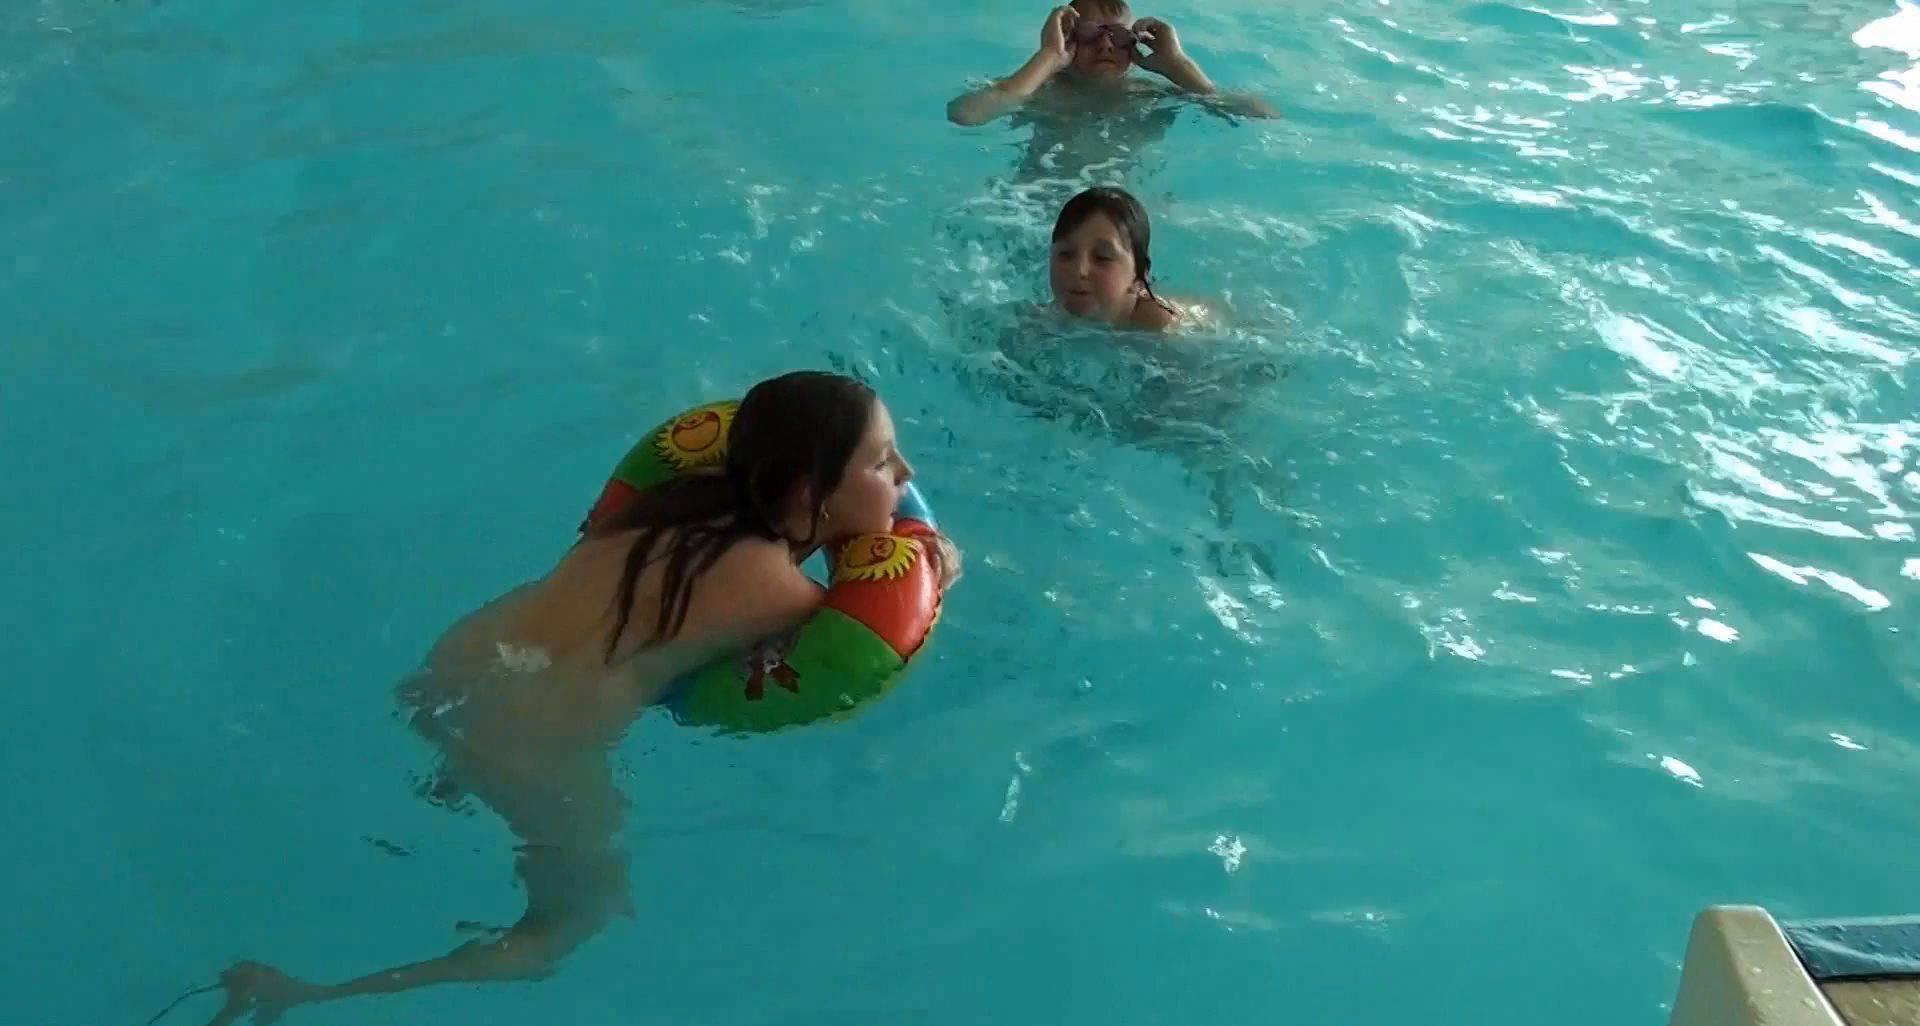 Naturist Videos Family Waterpool Funs - 2